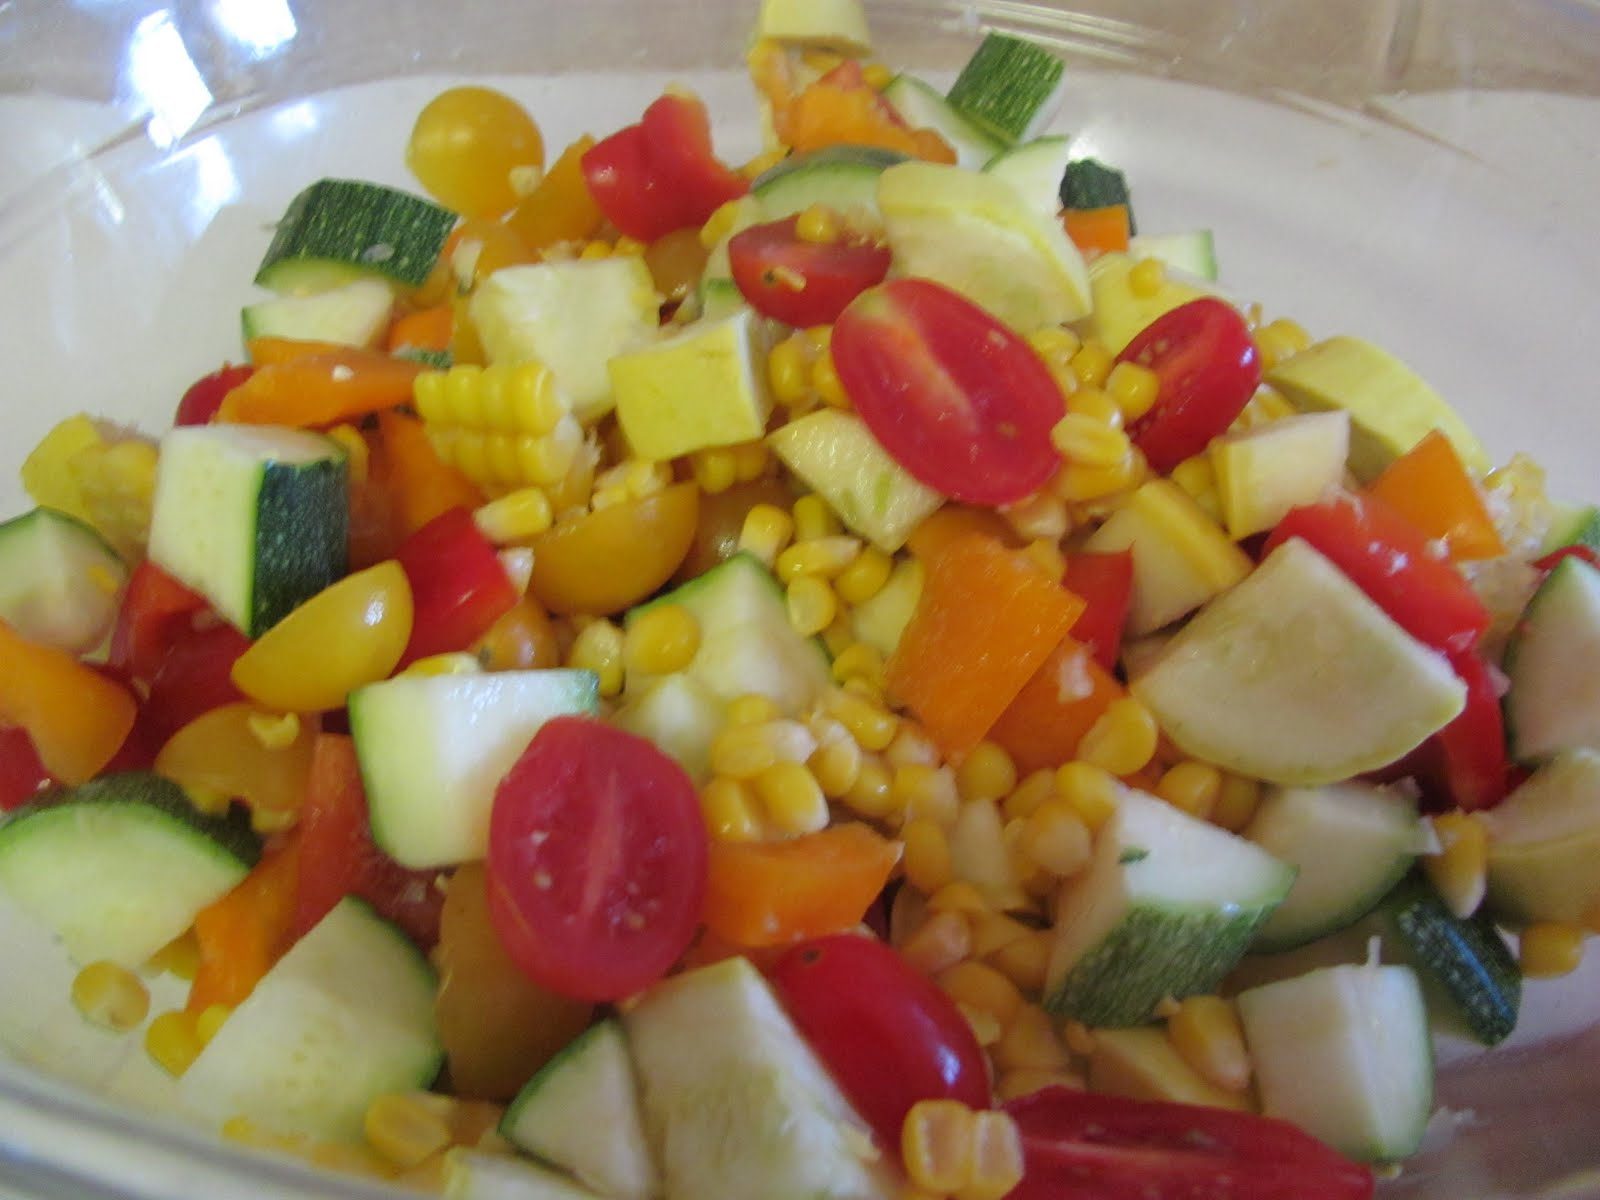 Growing Gourmets: Summer Bread Salad